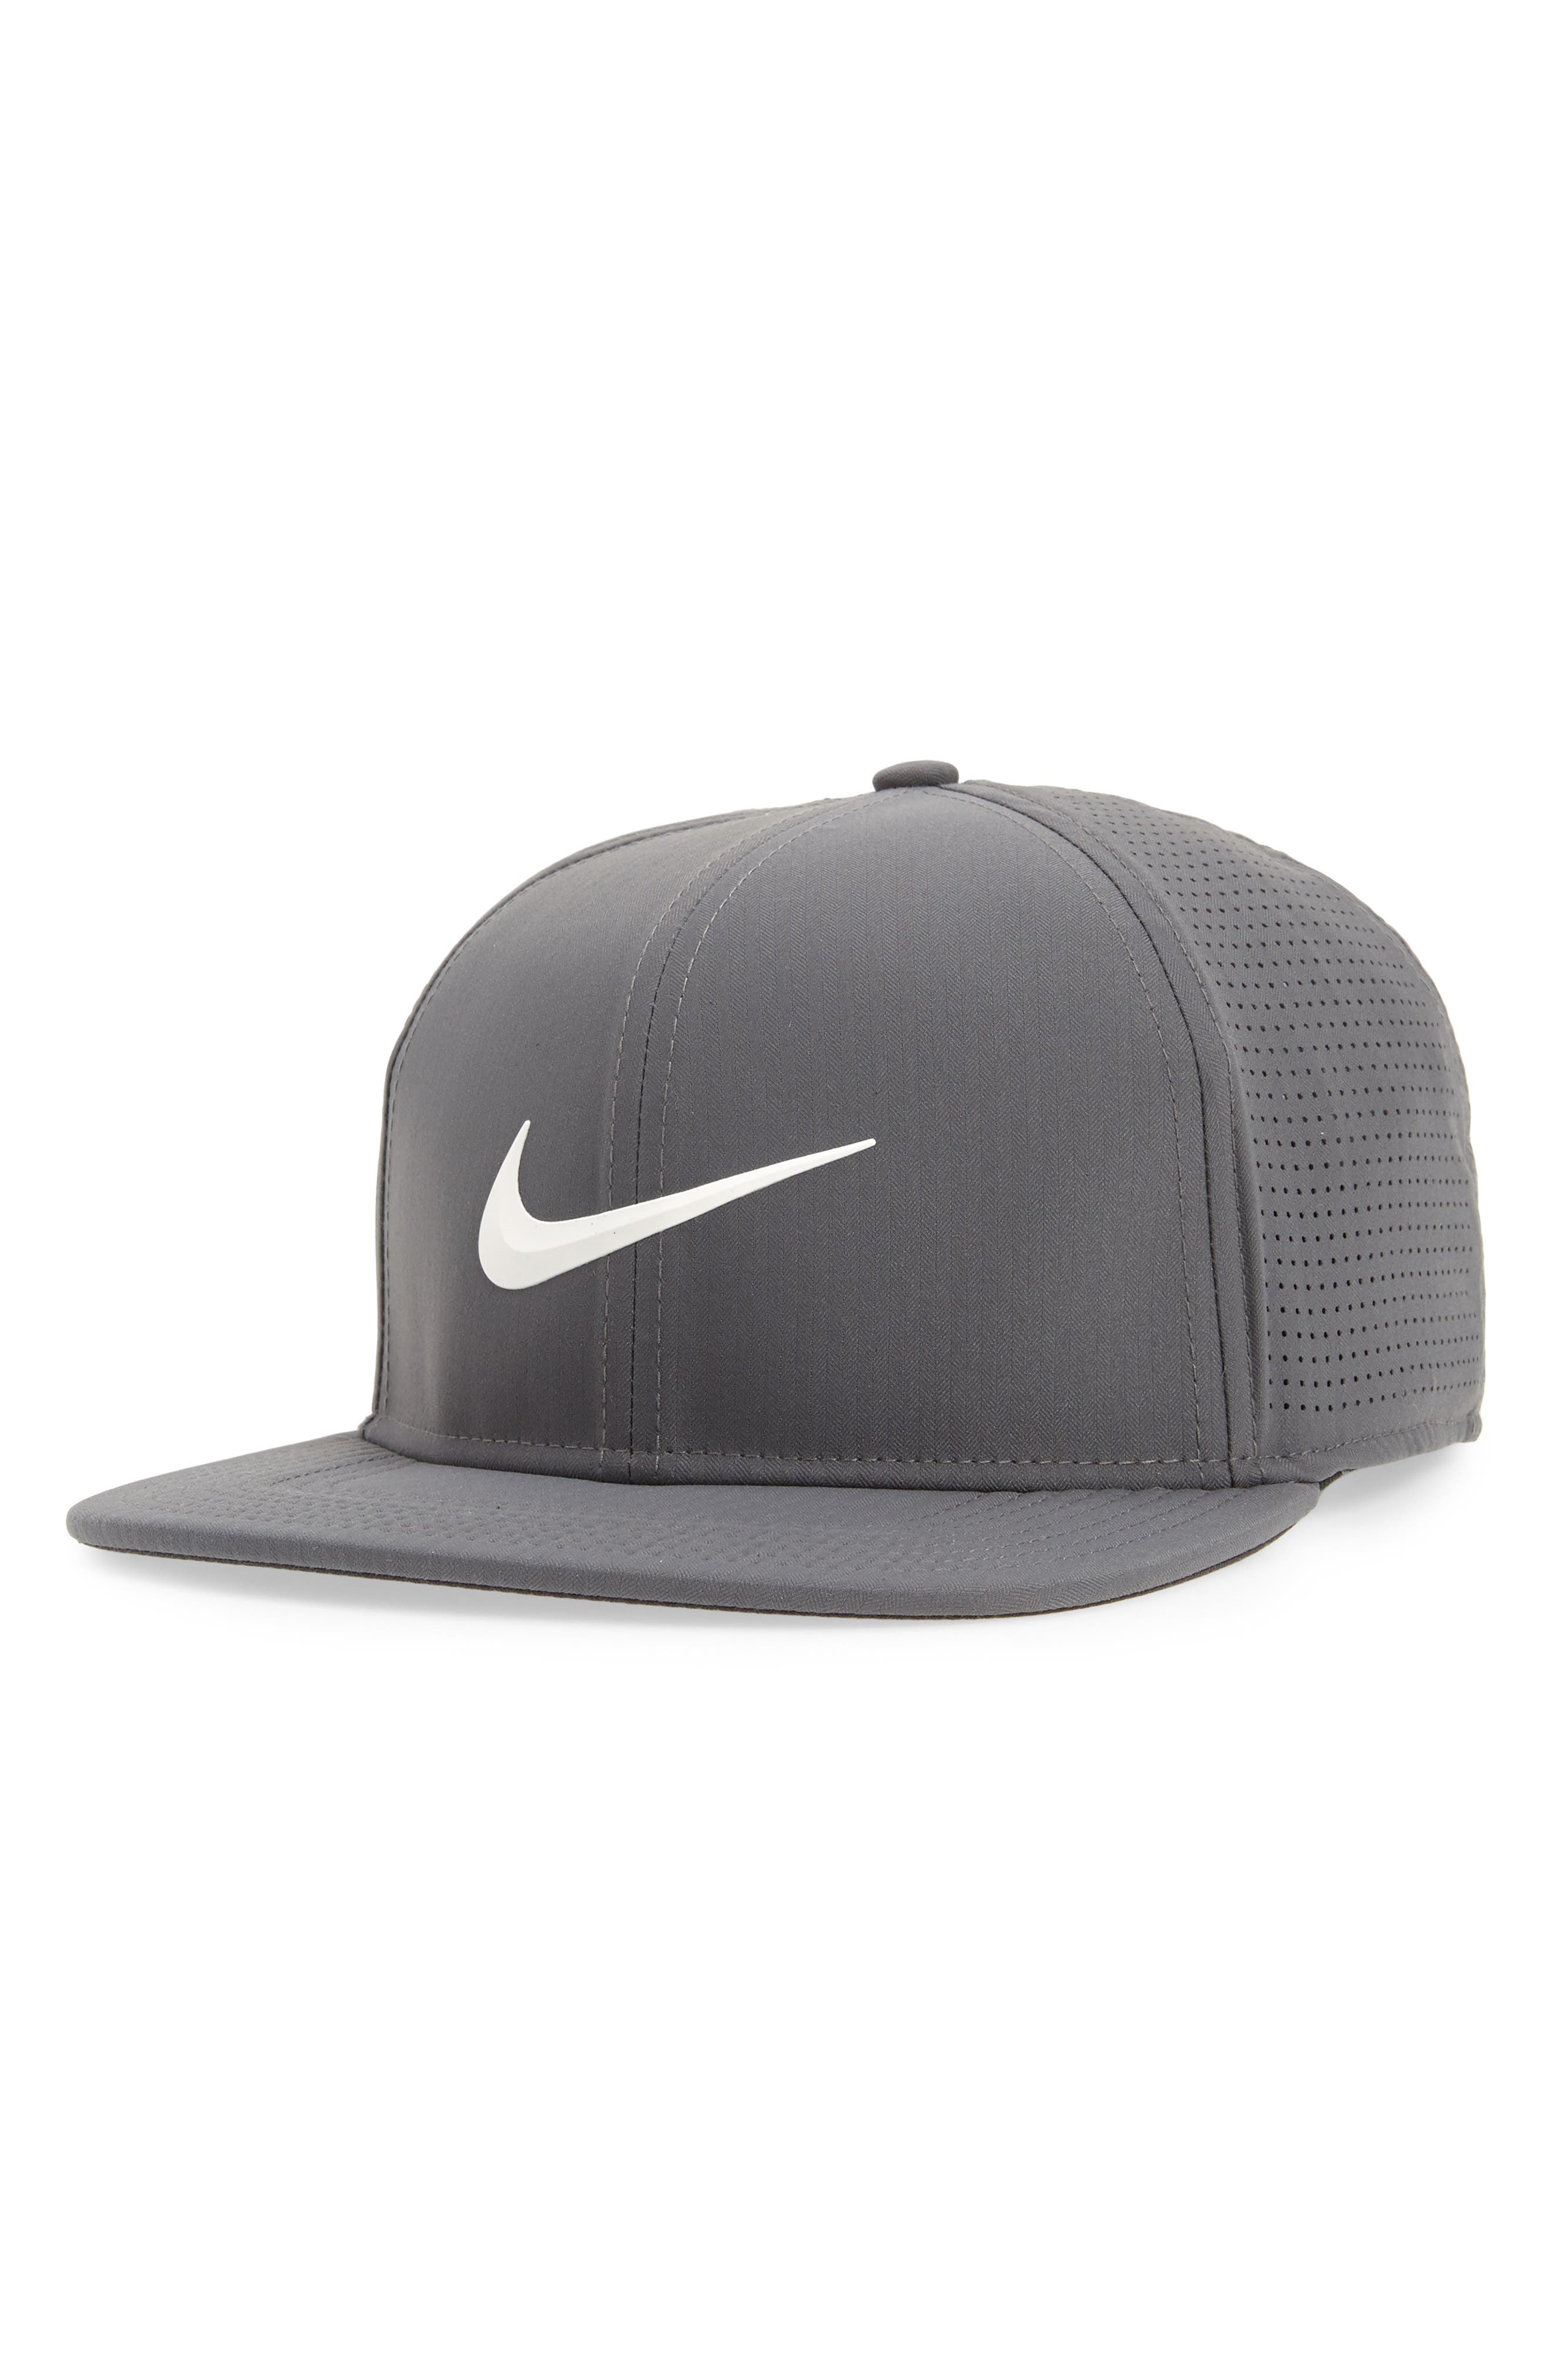 AeroBill Dry Golf Hat,                         Main,                         color, 021